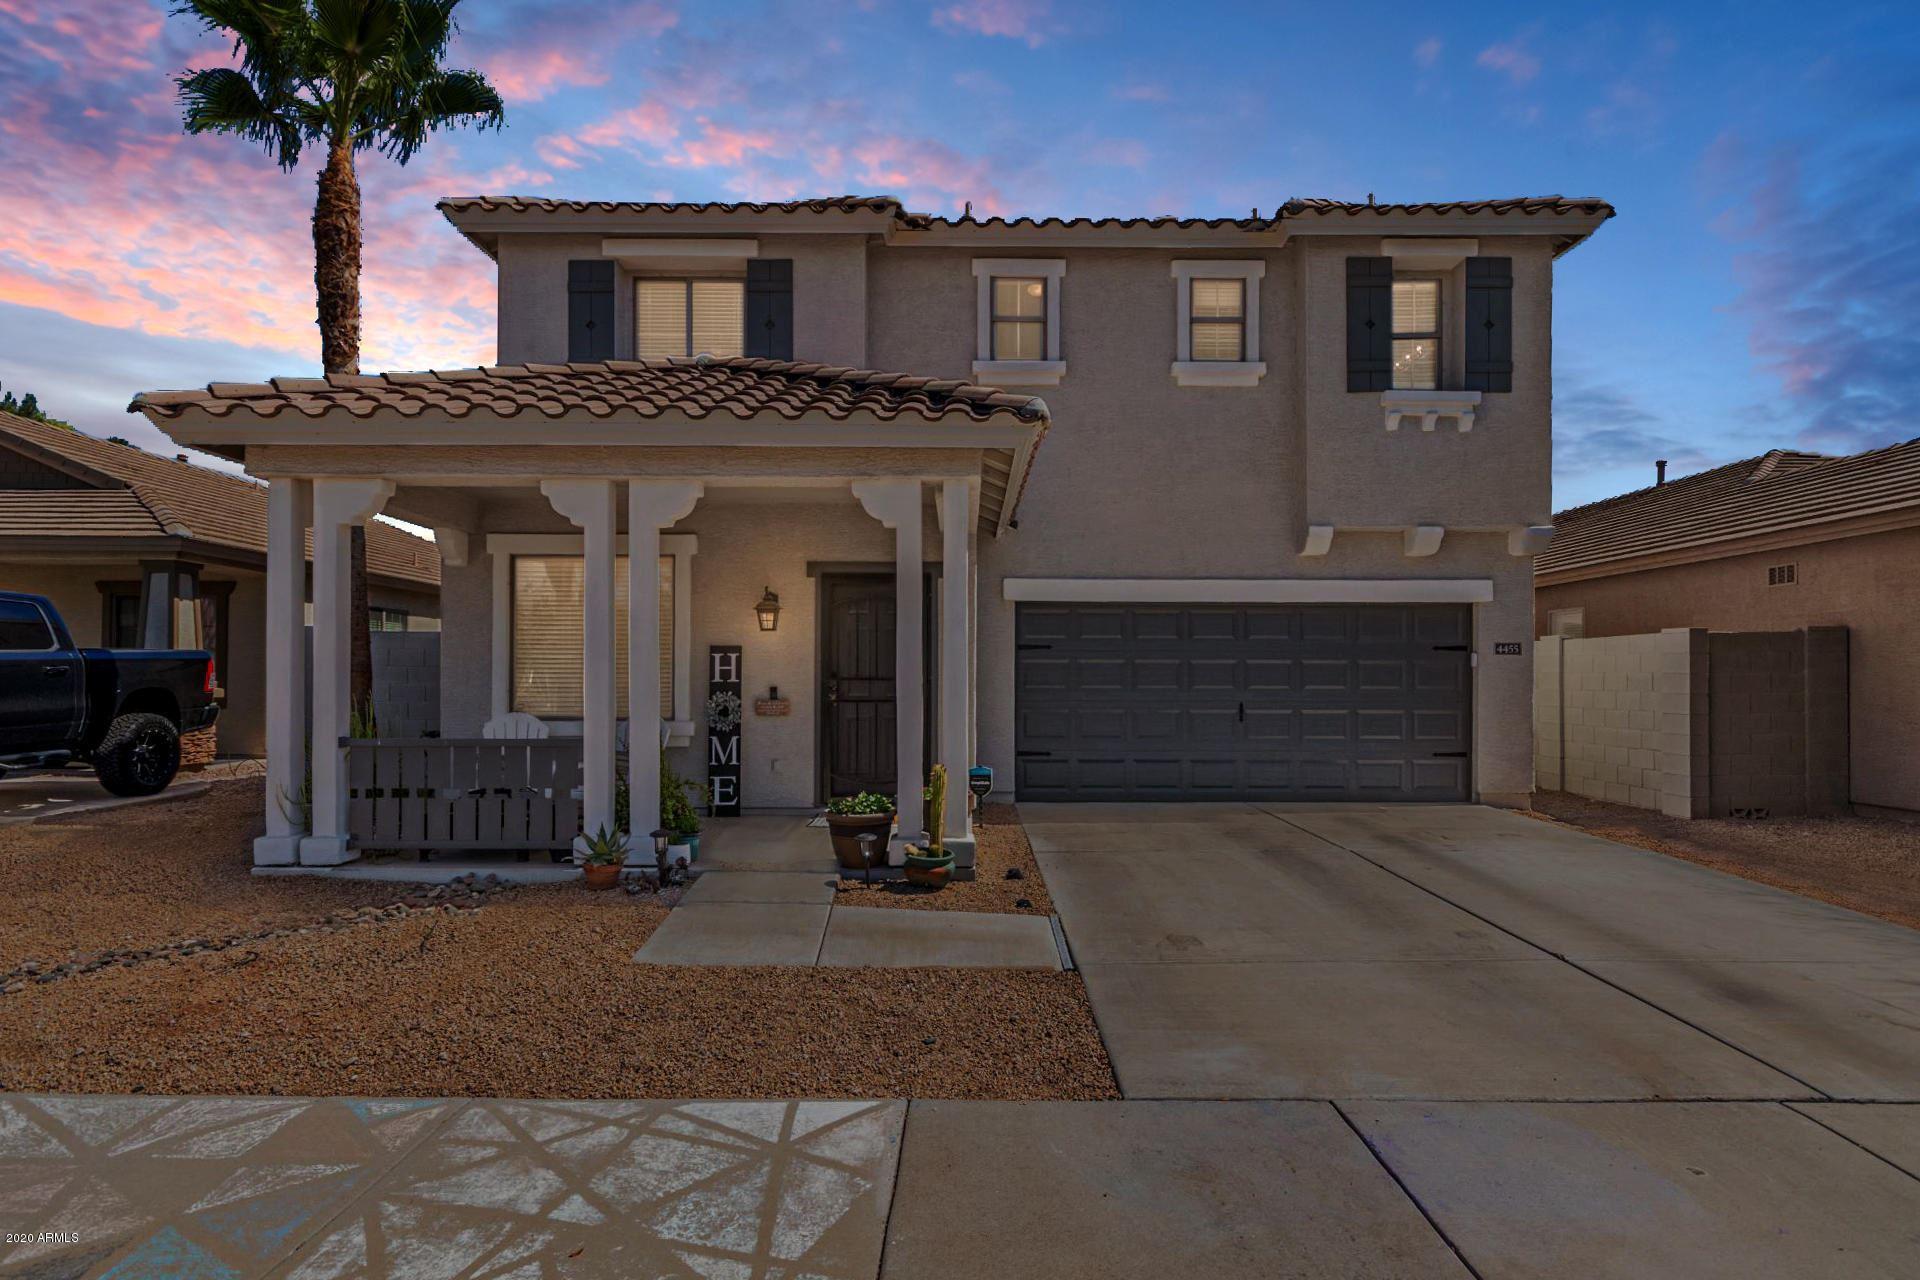 4455 E MEGAN Street, Gilbert, AZ 85295 - #: 6101224